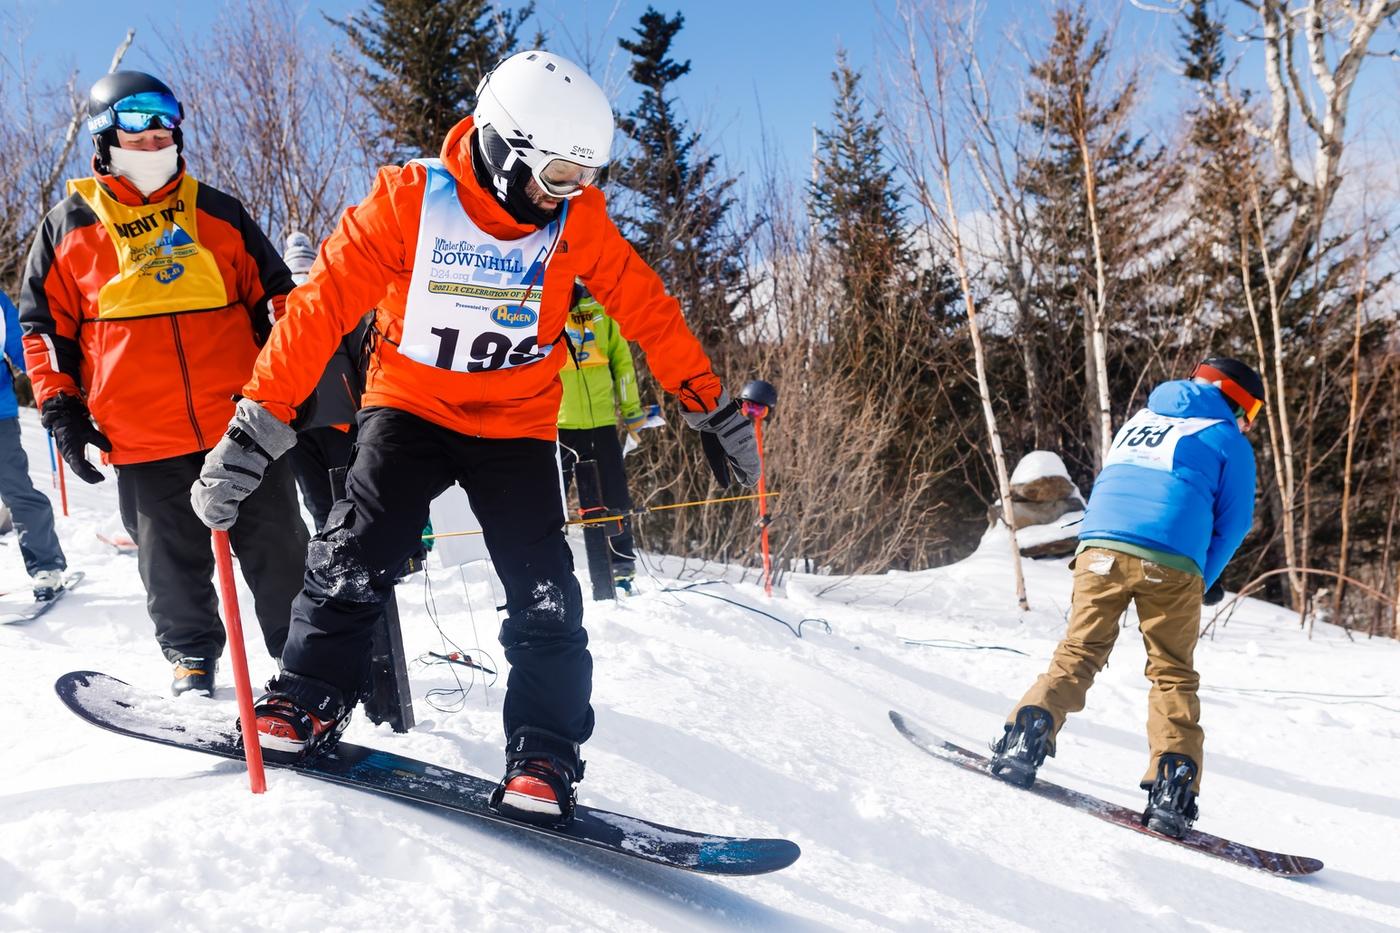 WinterKids Downhill 24 2021 SDP 3354